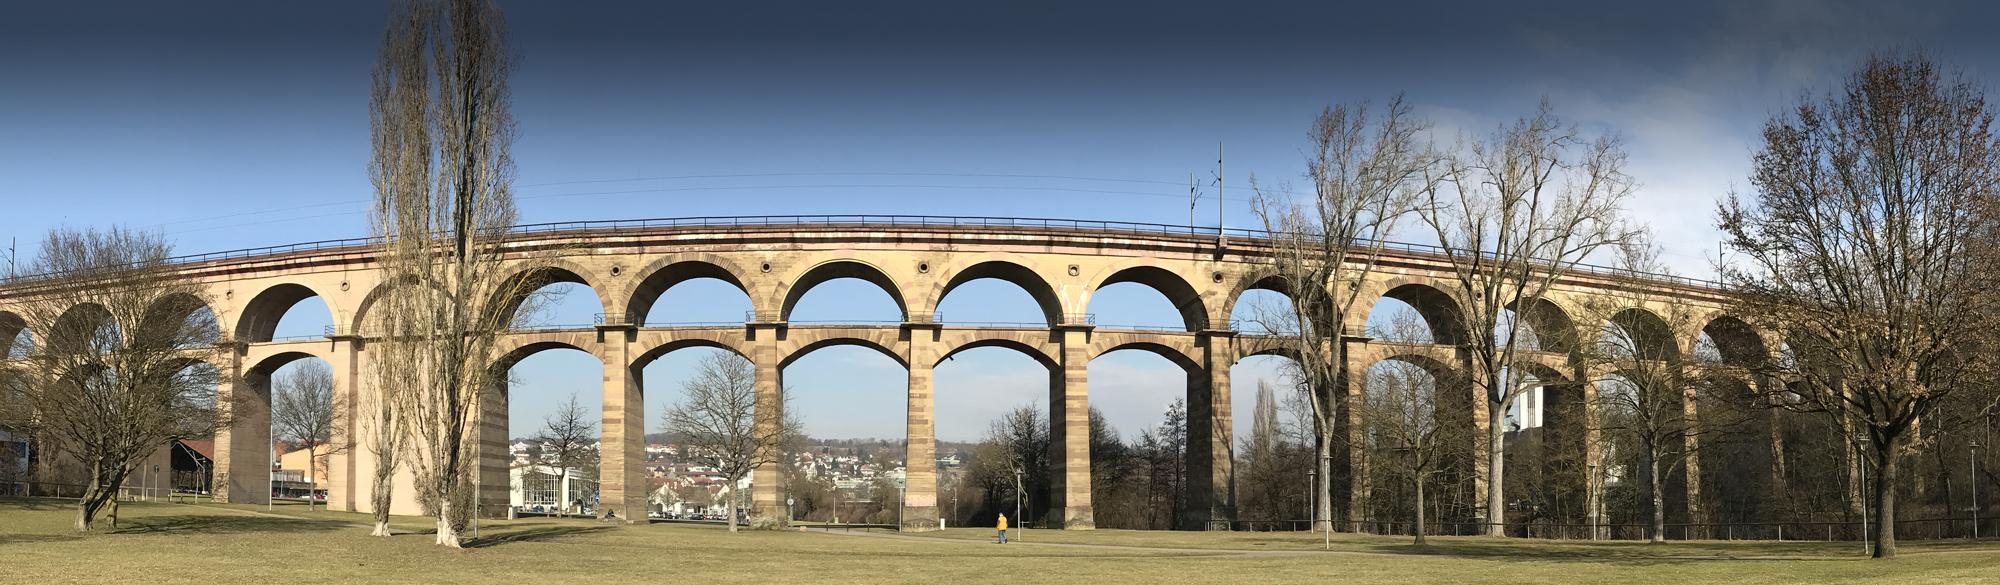 Viaduktw